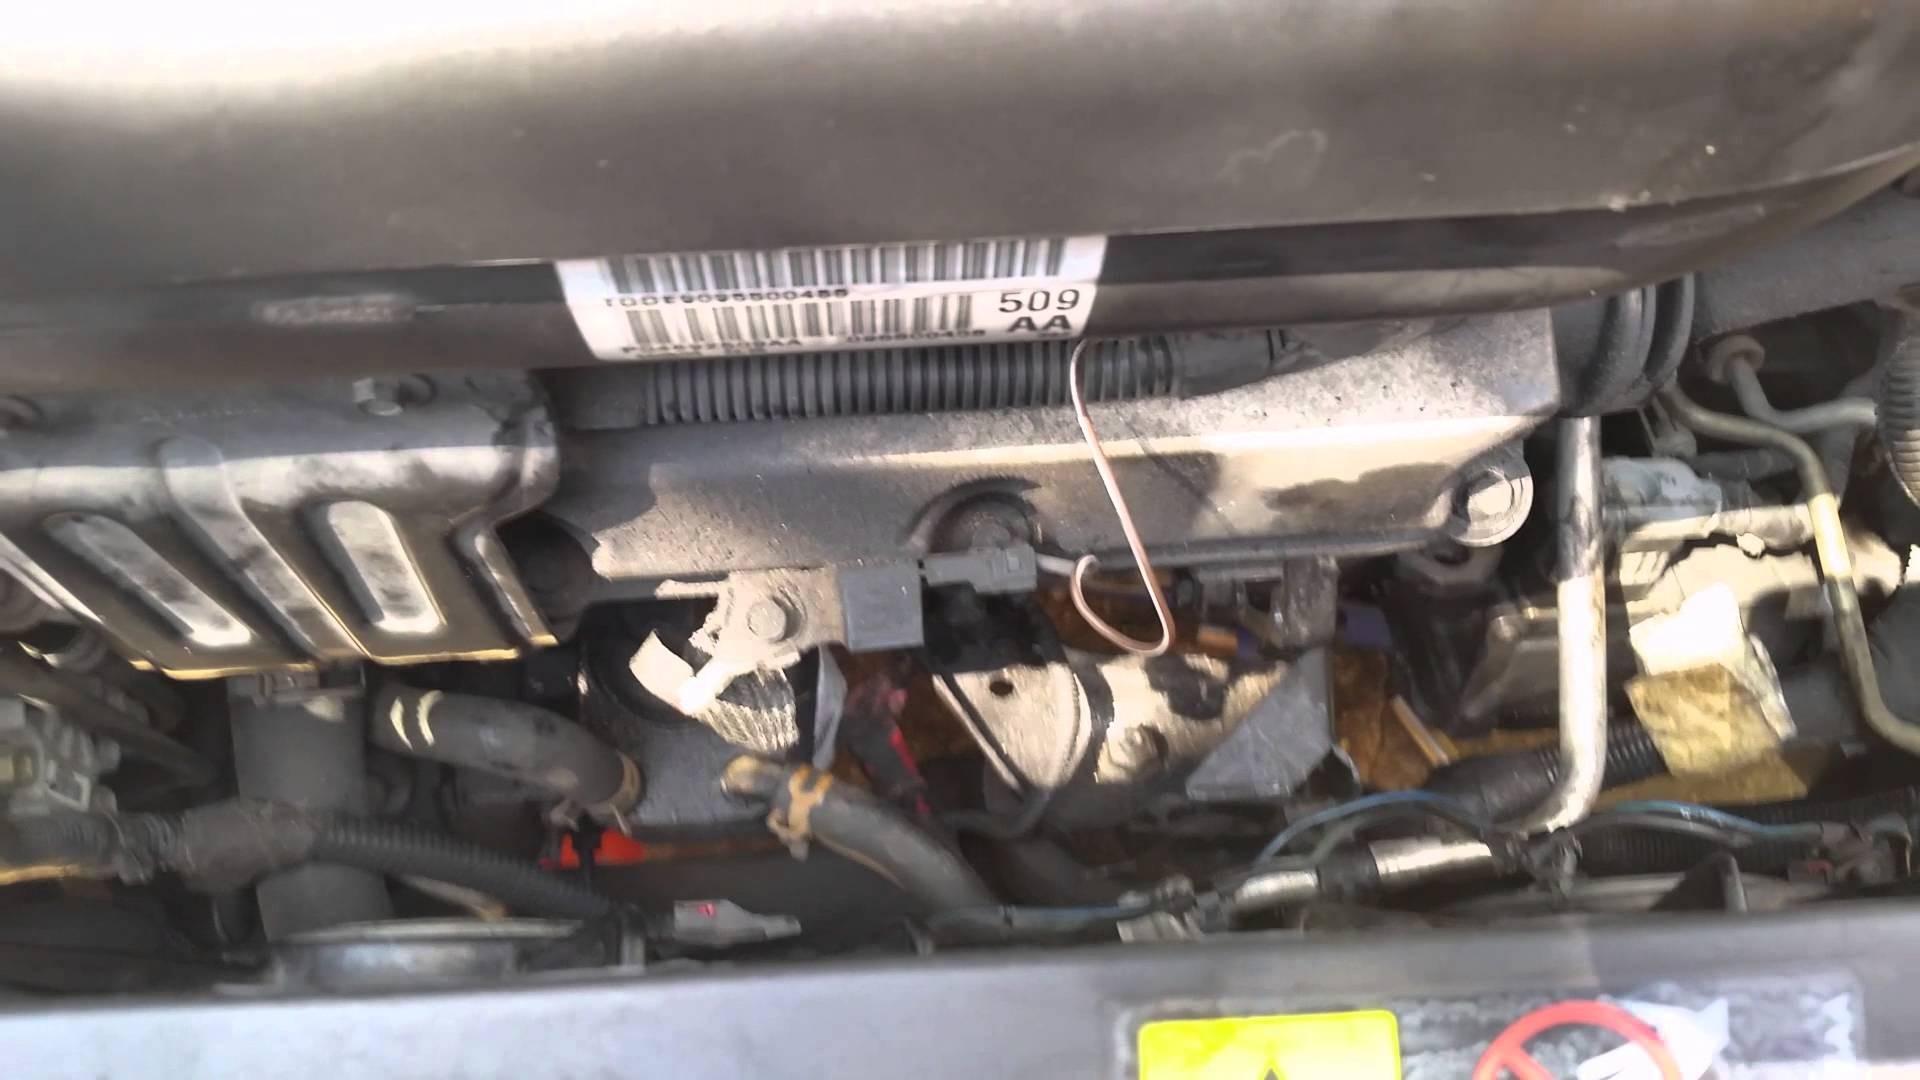 2004 Chrysler Pacifica Engine Diagram Replacing A Starter On A 2005 Chrysler  Pacifica Of 2004 Chrysler